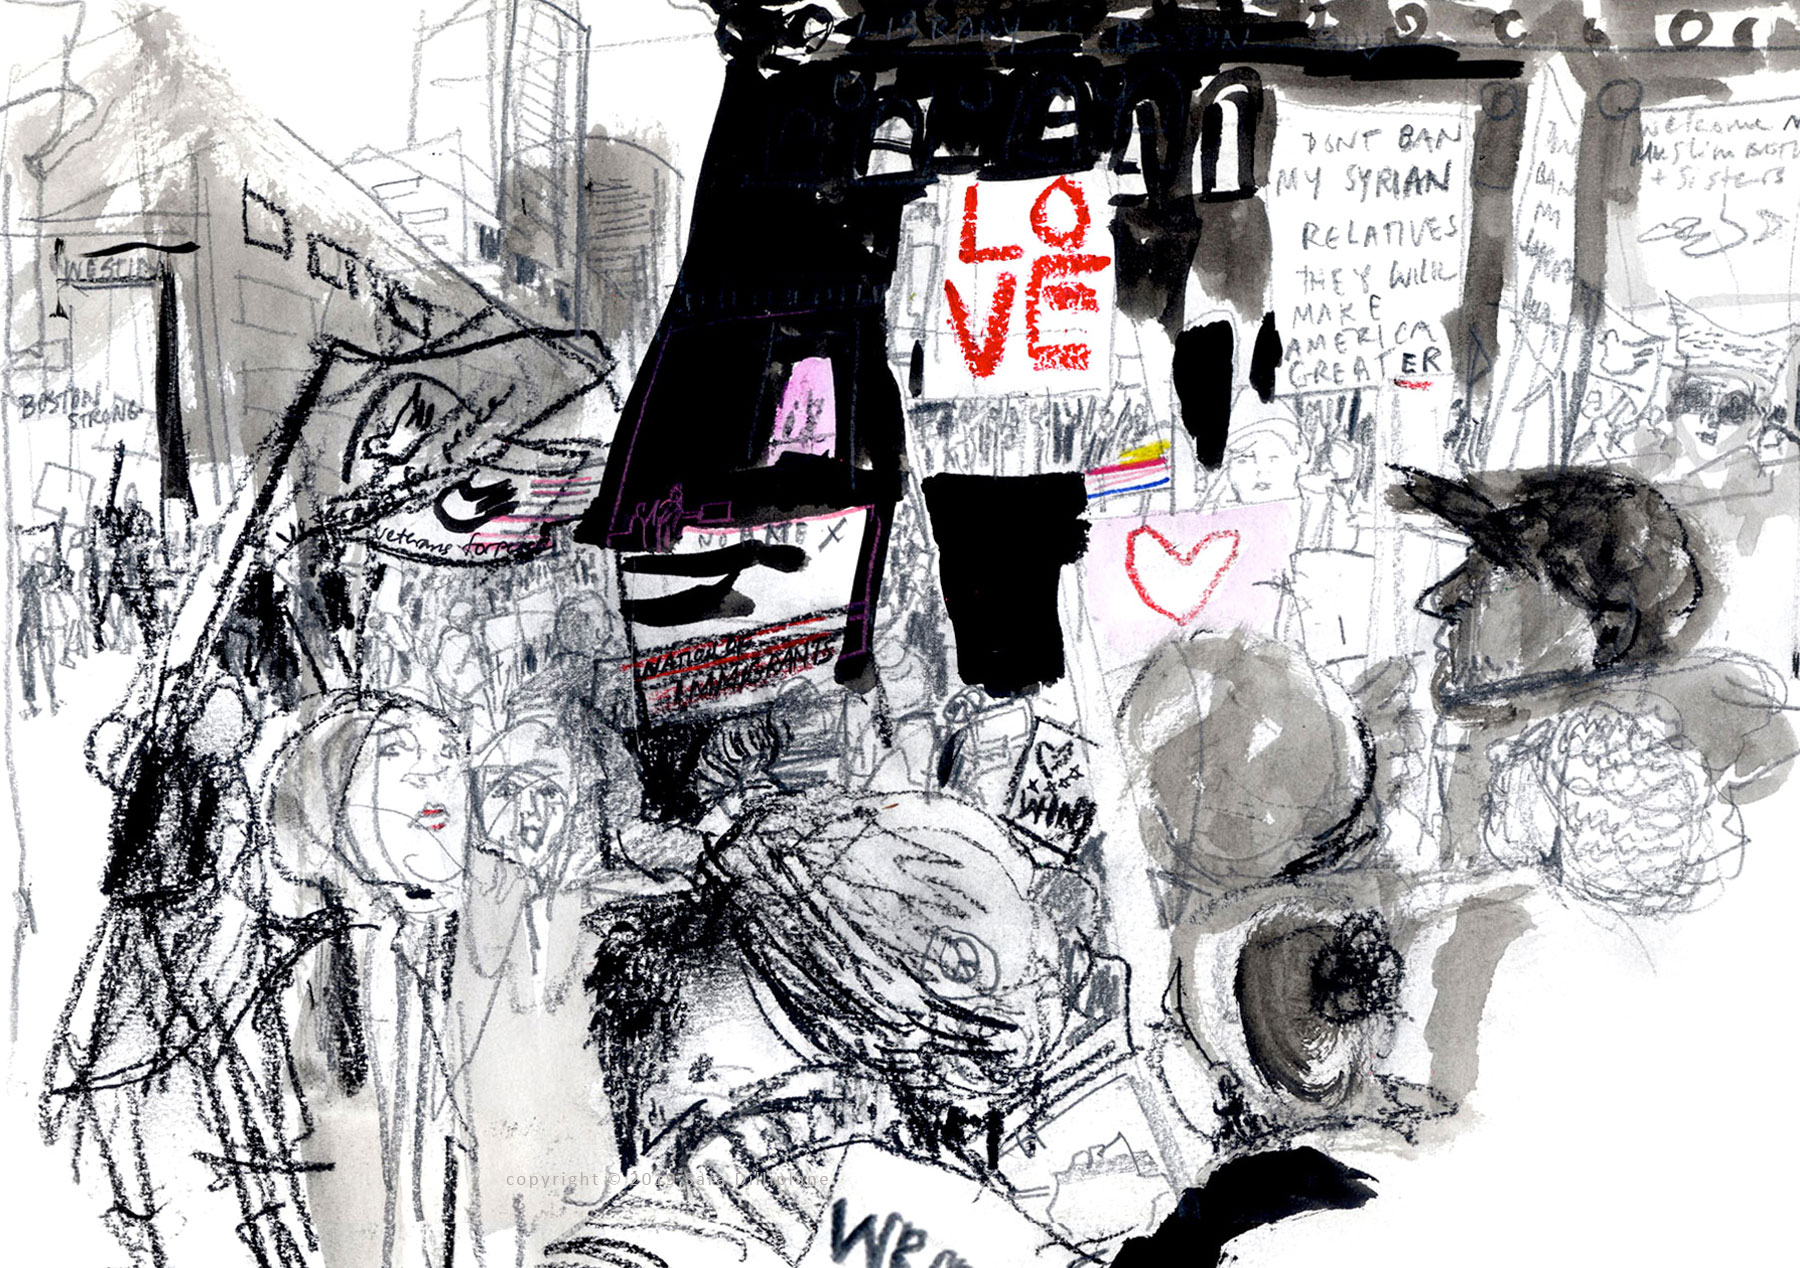 Immigrant Solidarity rally, Boston, 2/17